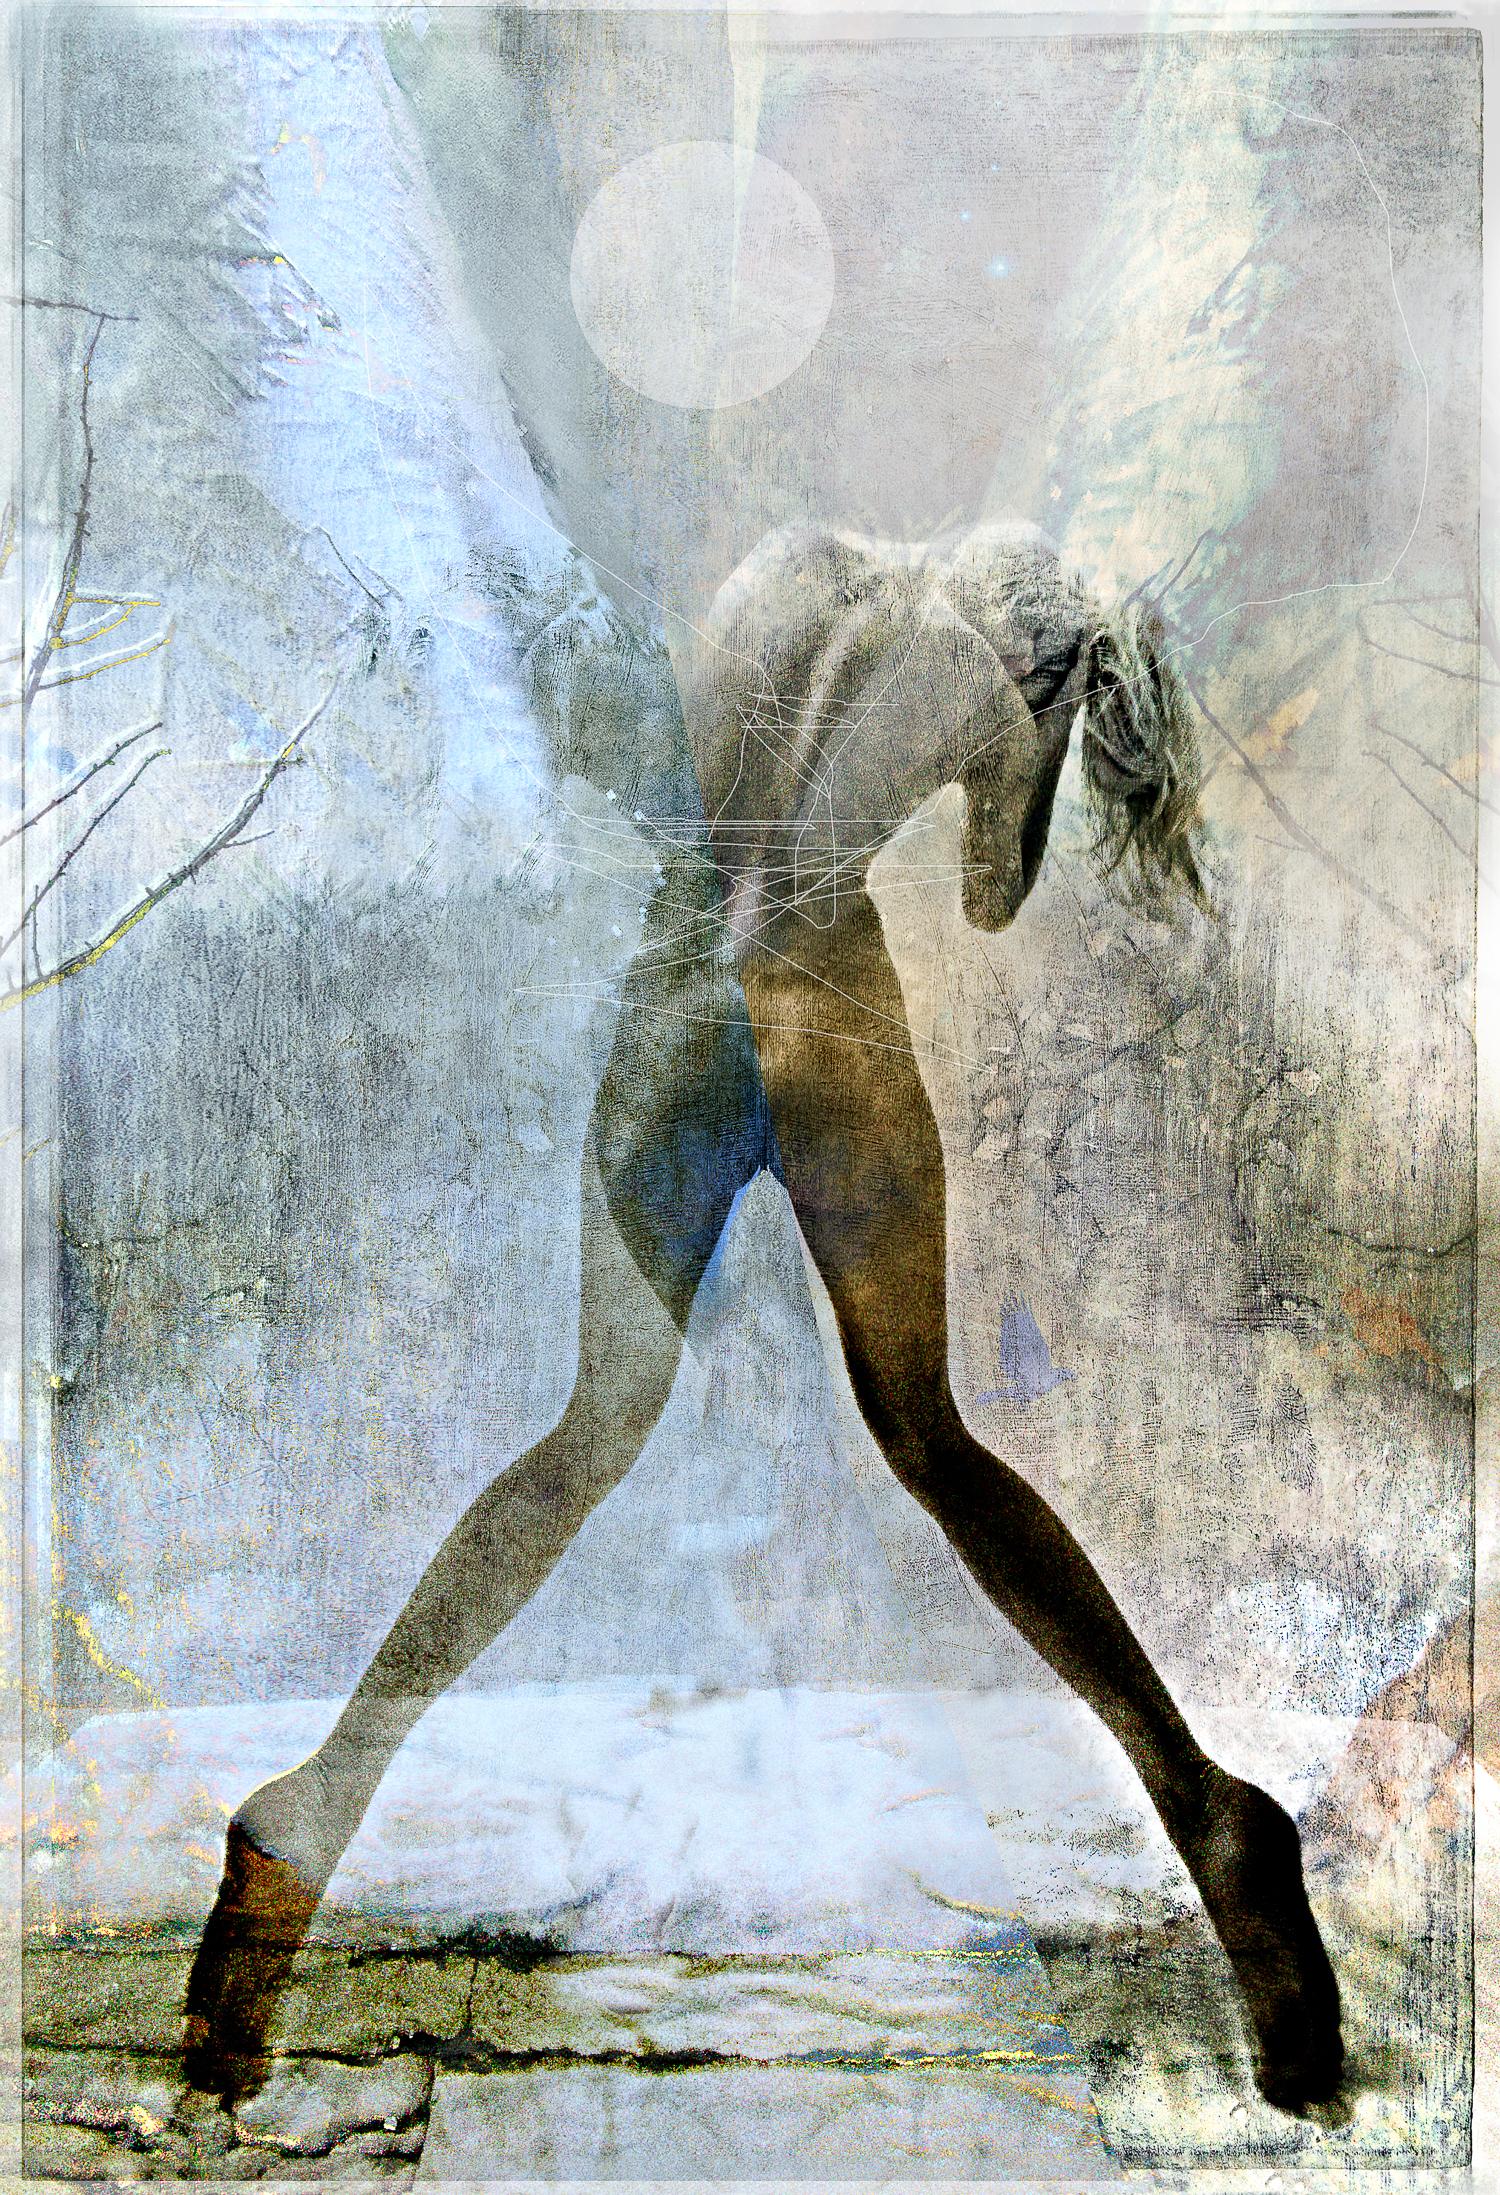 Angel_canvas_unsharpmask.jpg